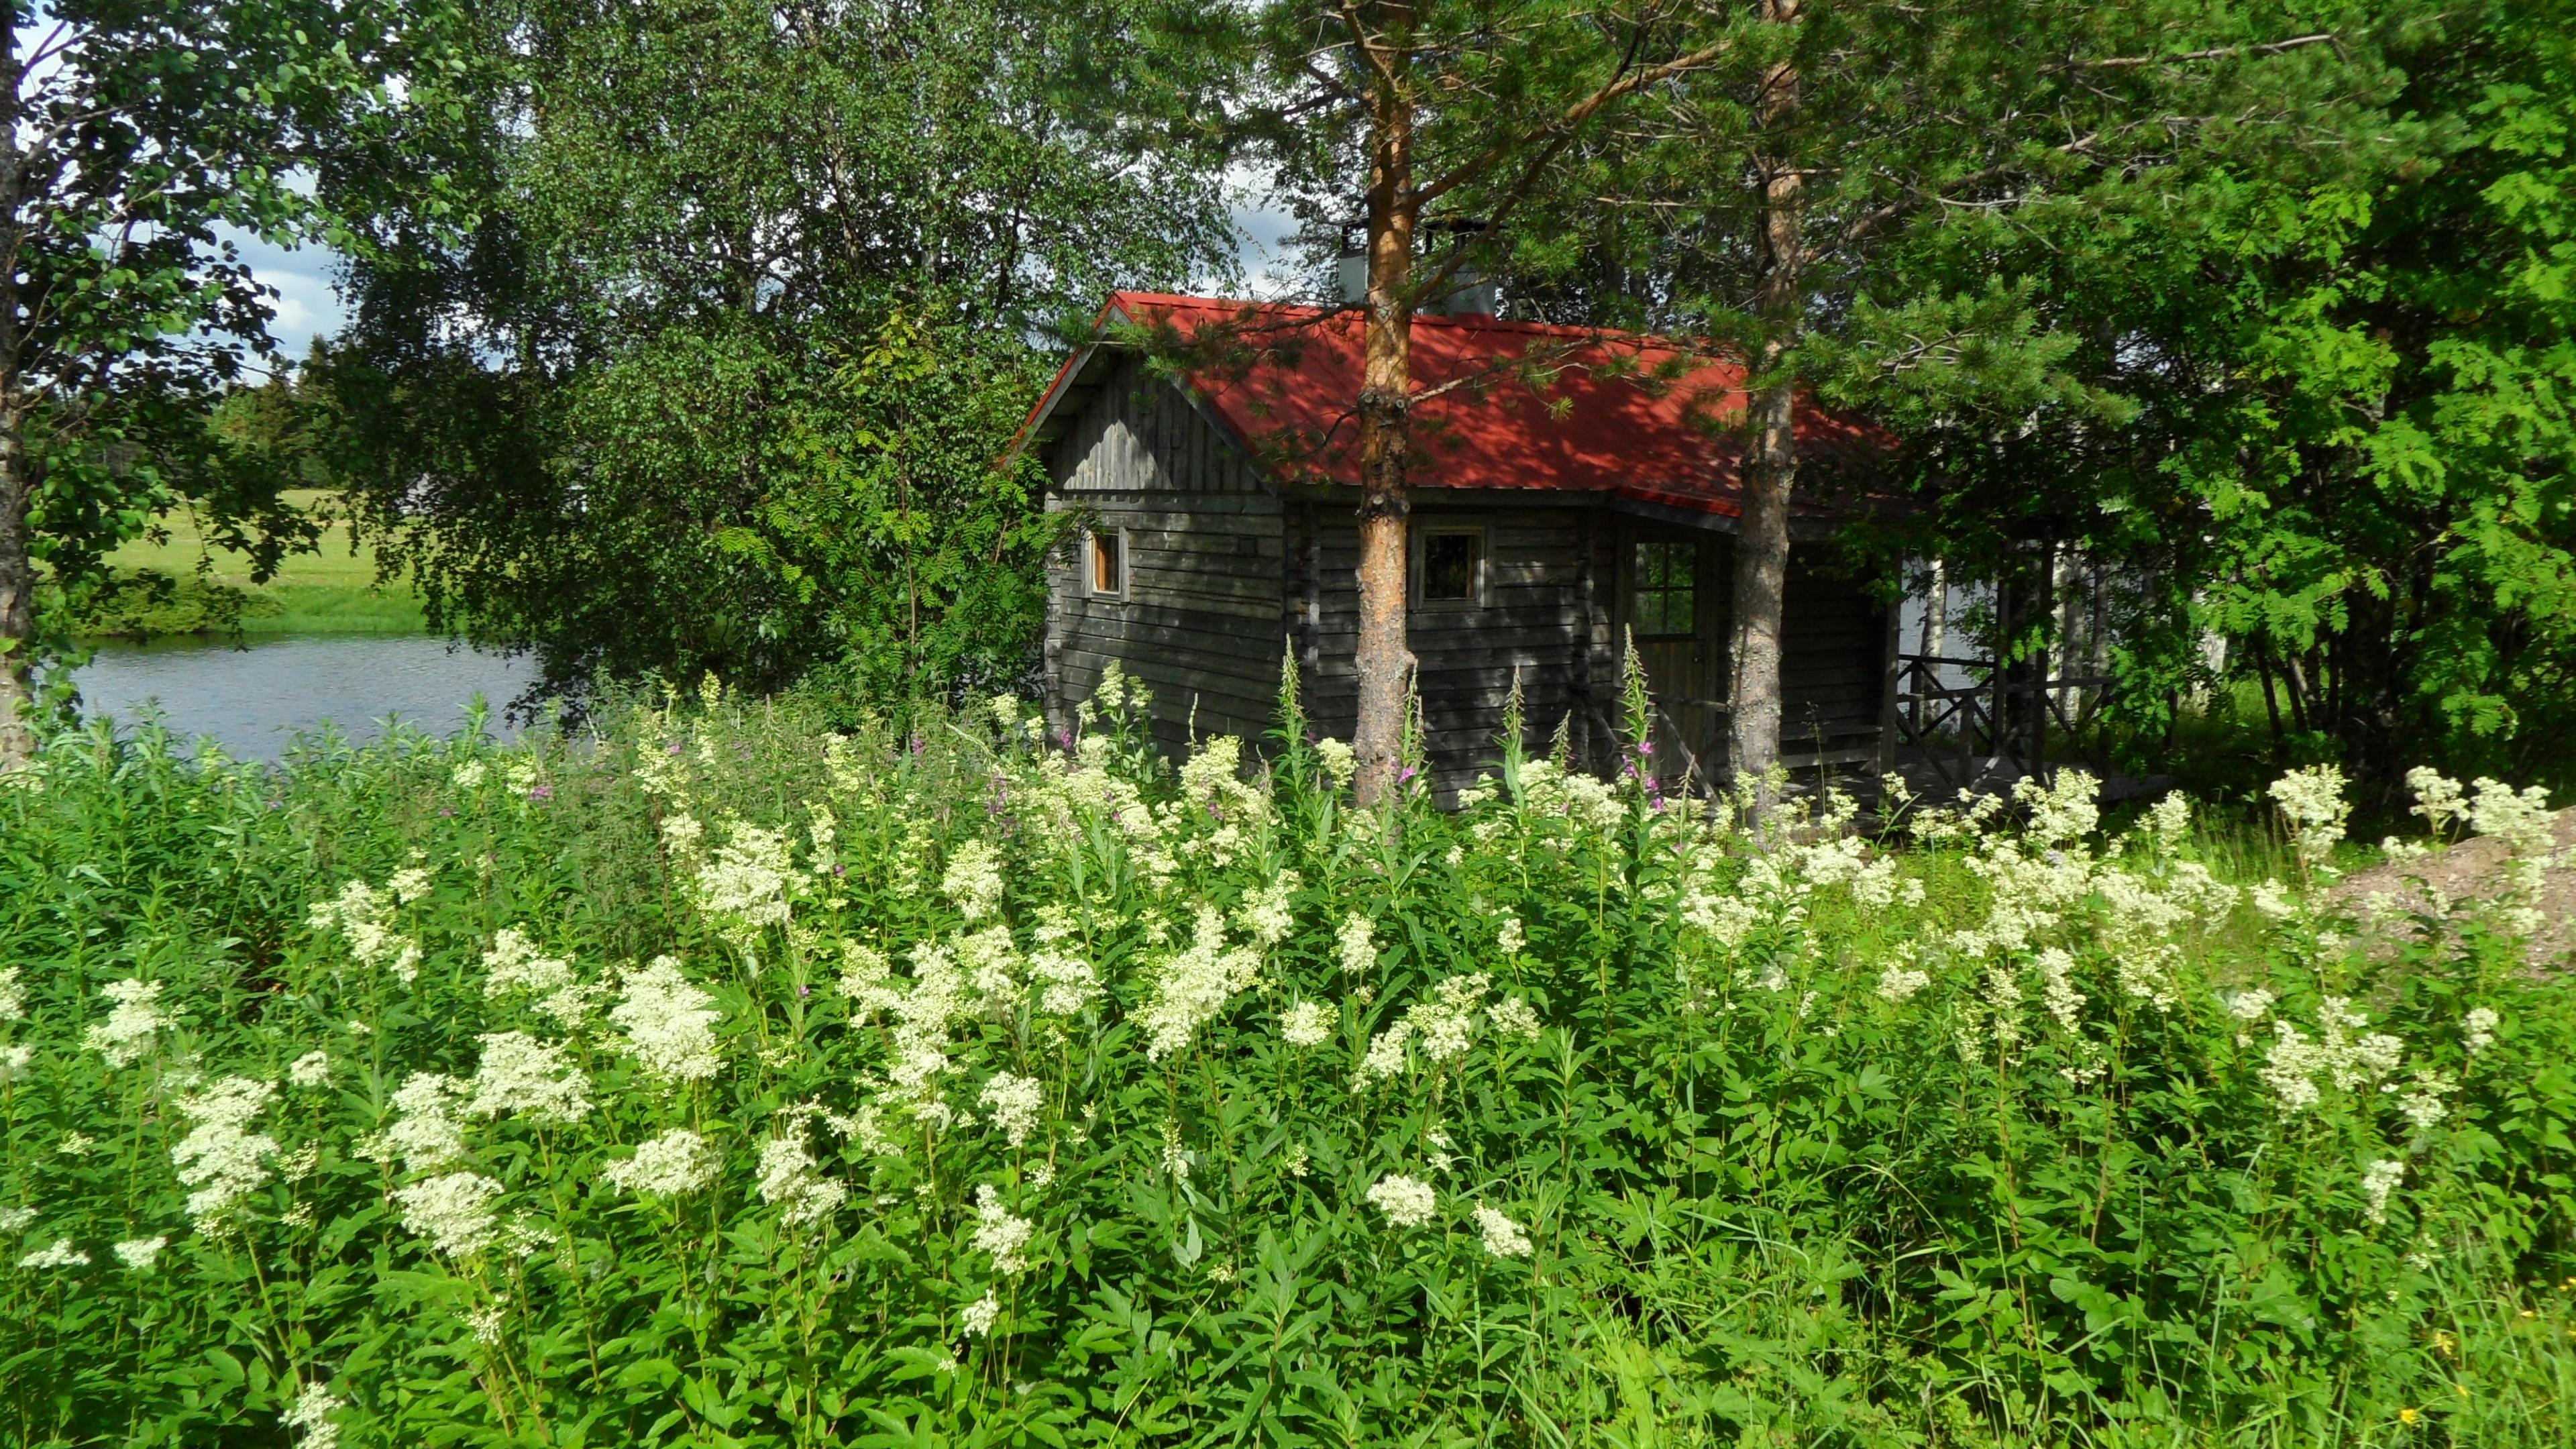 Hut under the trees wallpaper